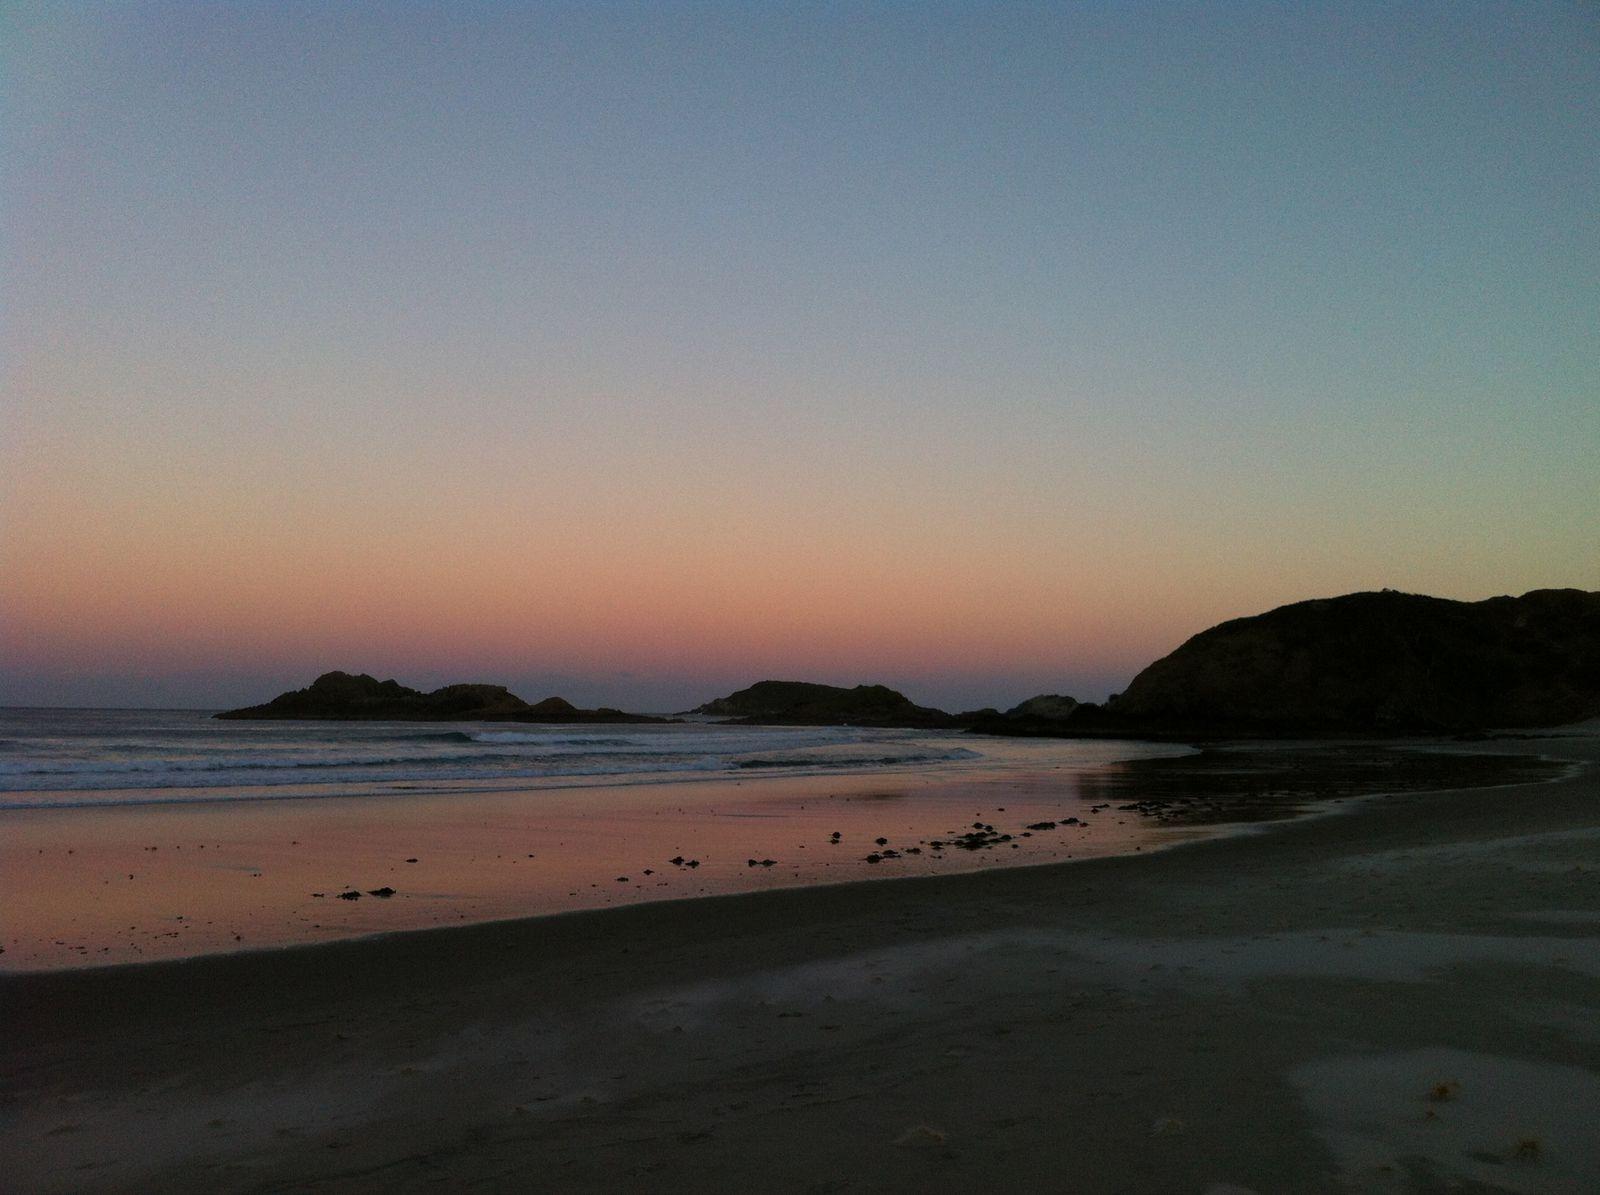 Ocean Beach by night